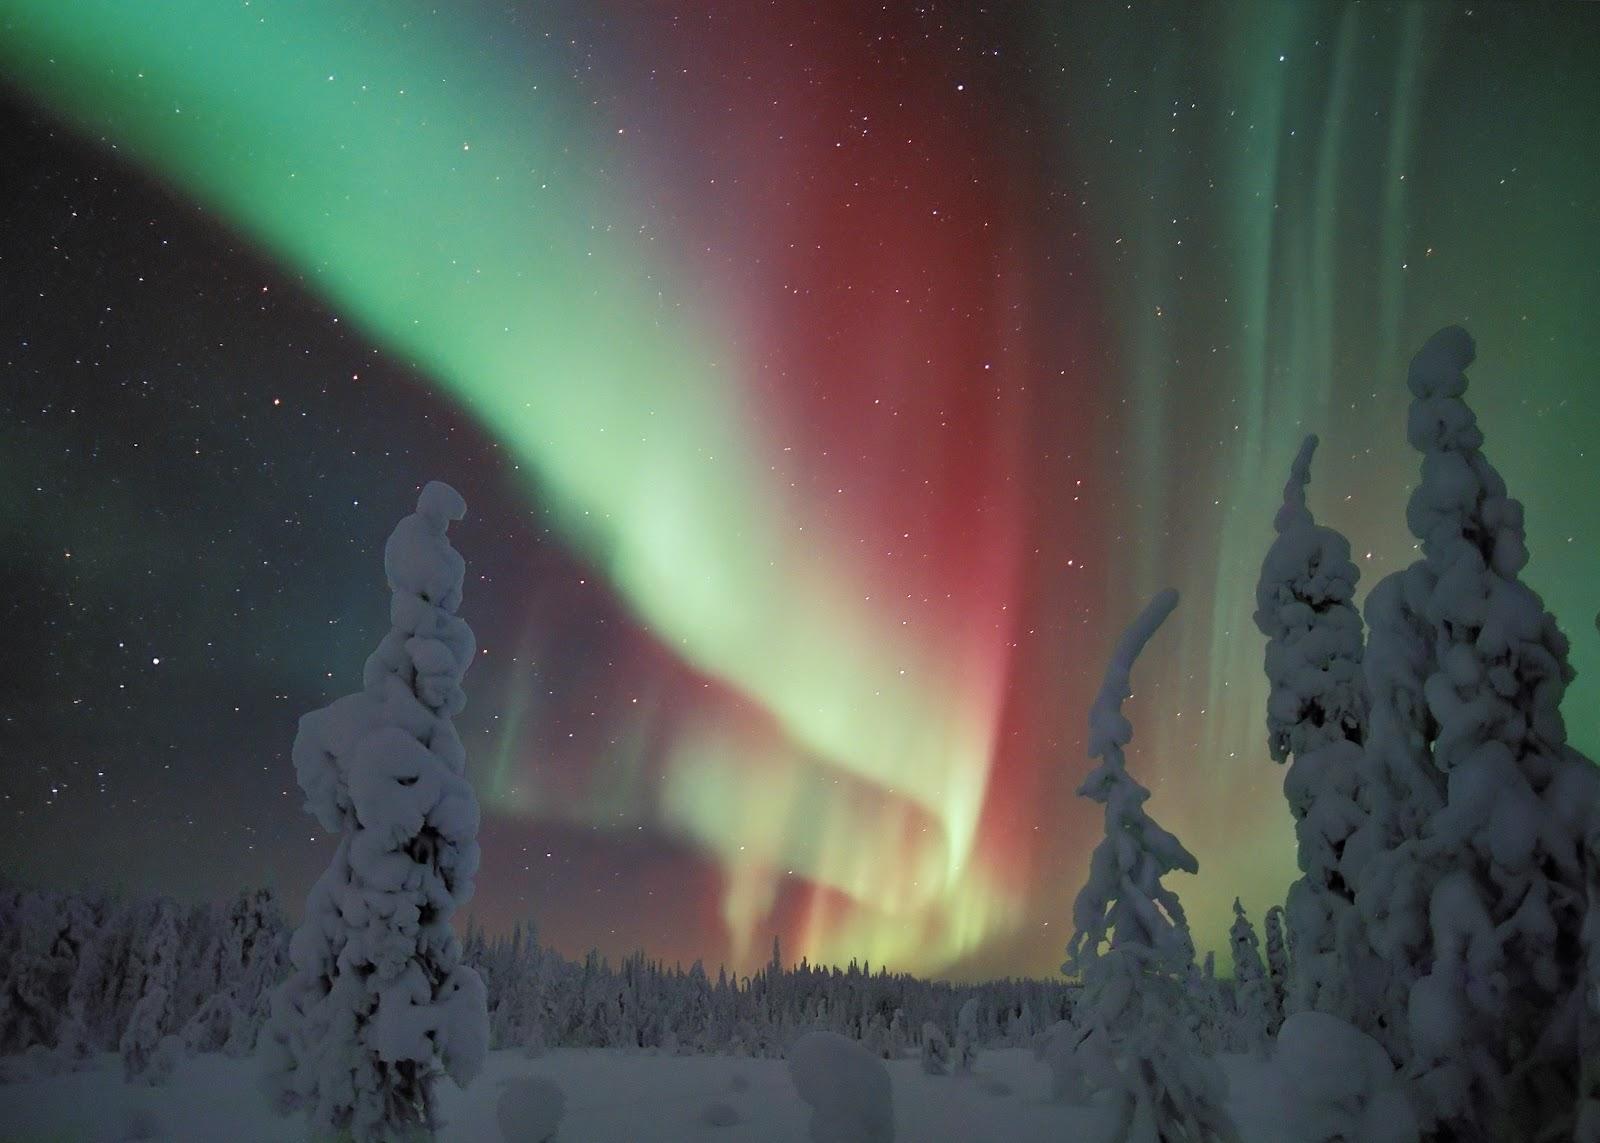 Northern_Lights_in_Snowy_Forest.jpg